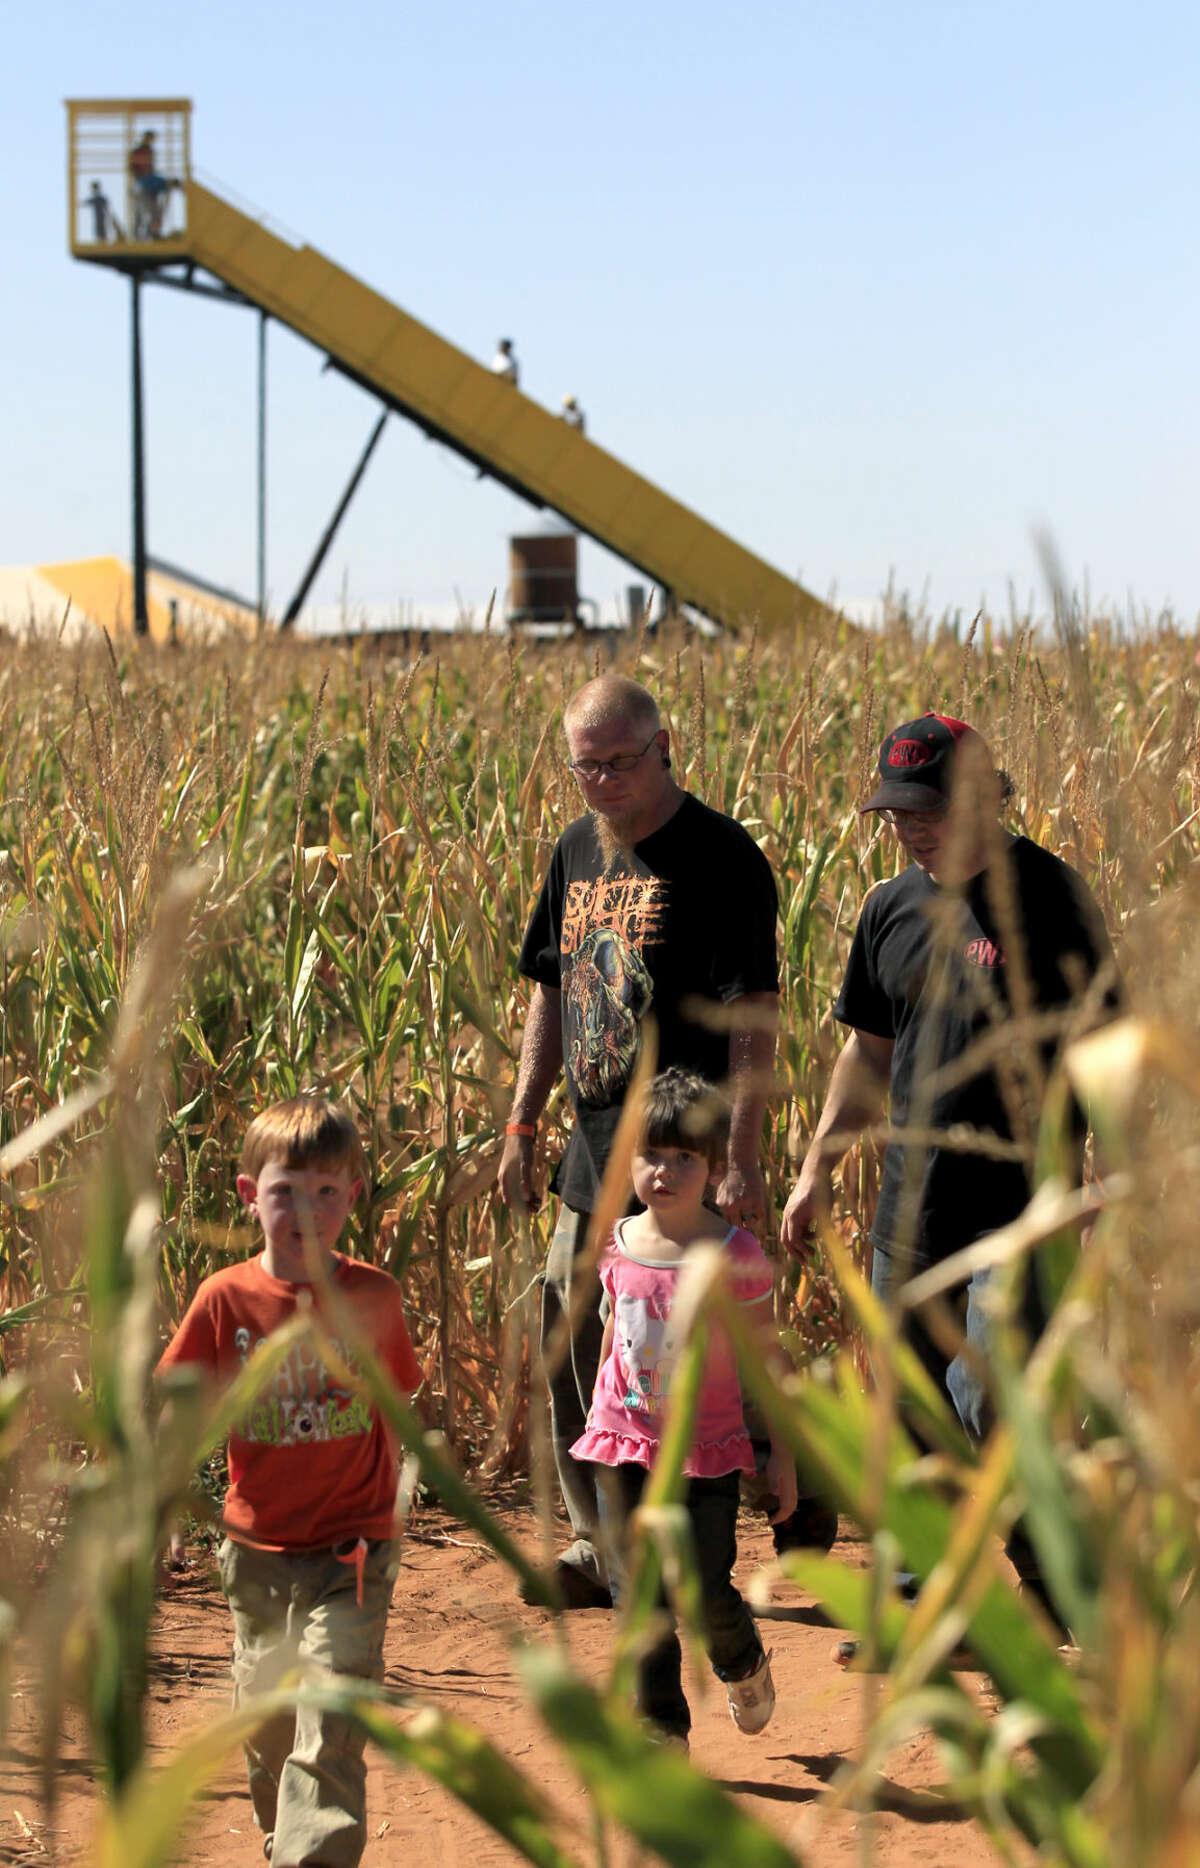 FILE PHOTO: Corn maze at Fiddlesticks Farms